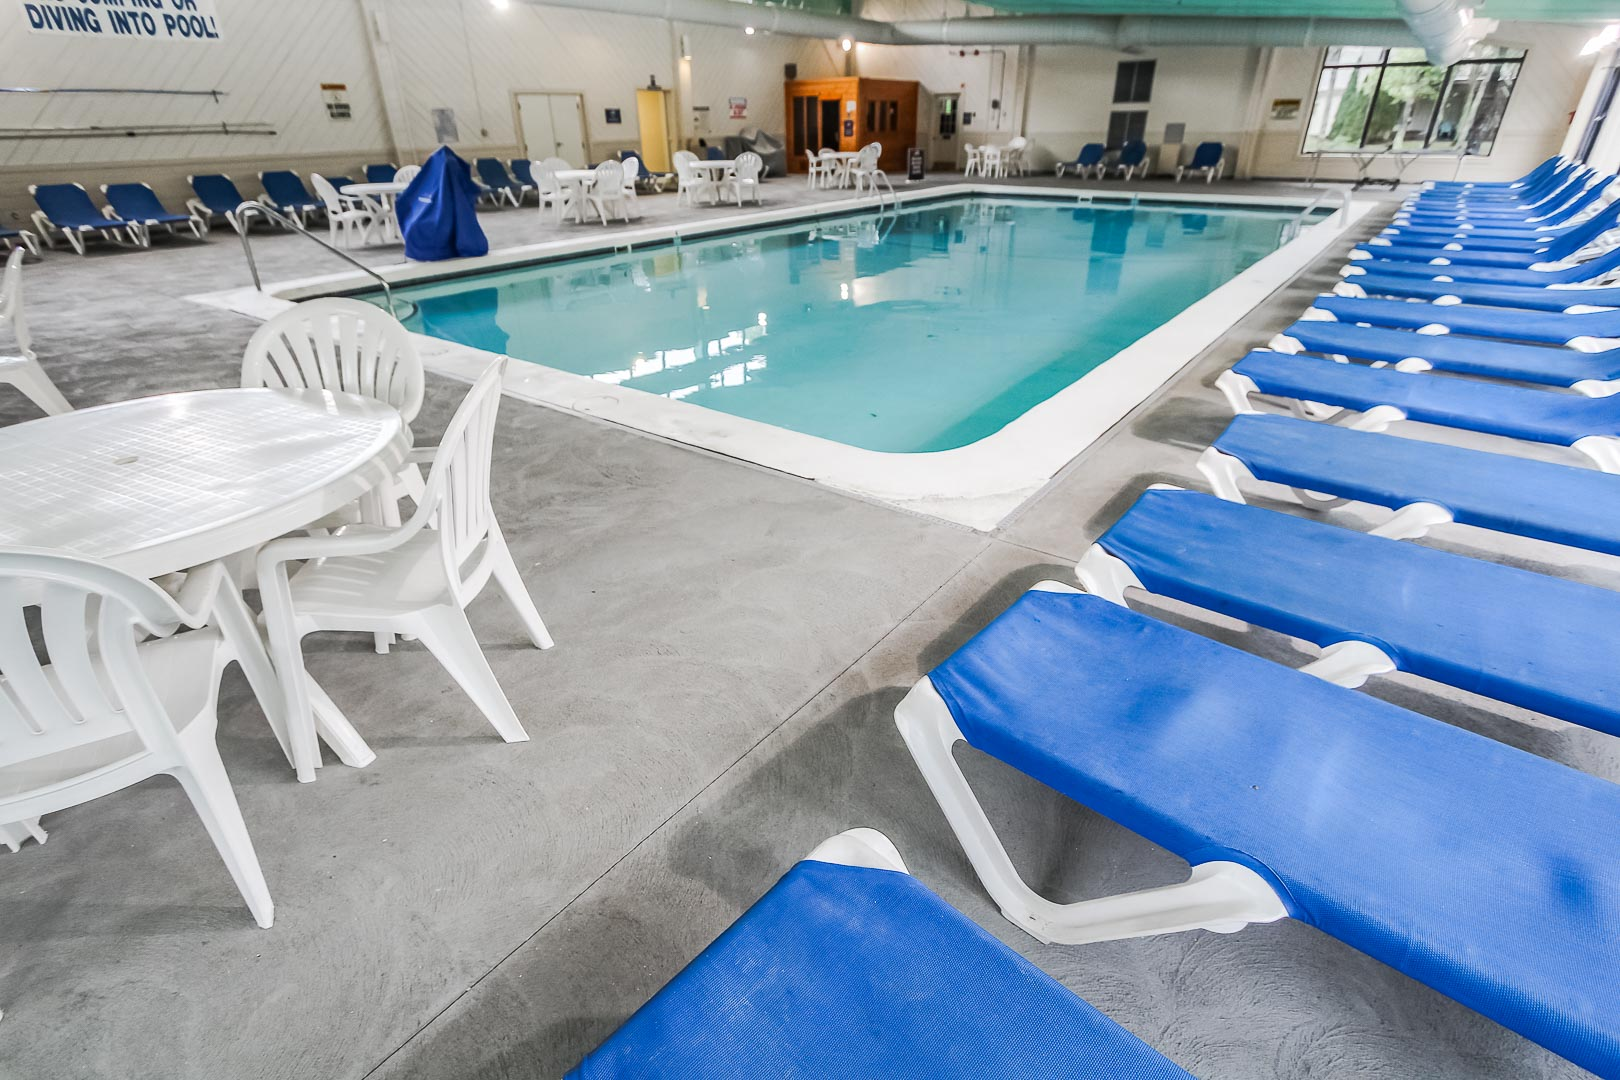 A quaint indoor swimming pool at VRI's Sea Mist Resort in Massachusetts.